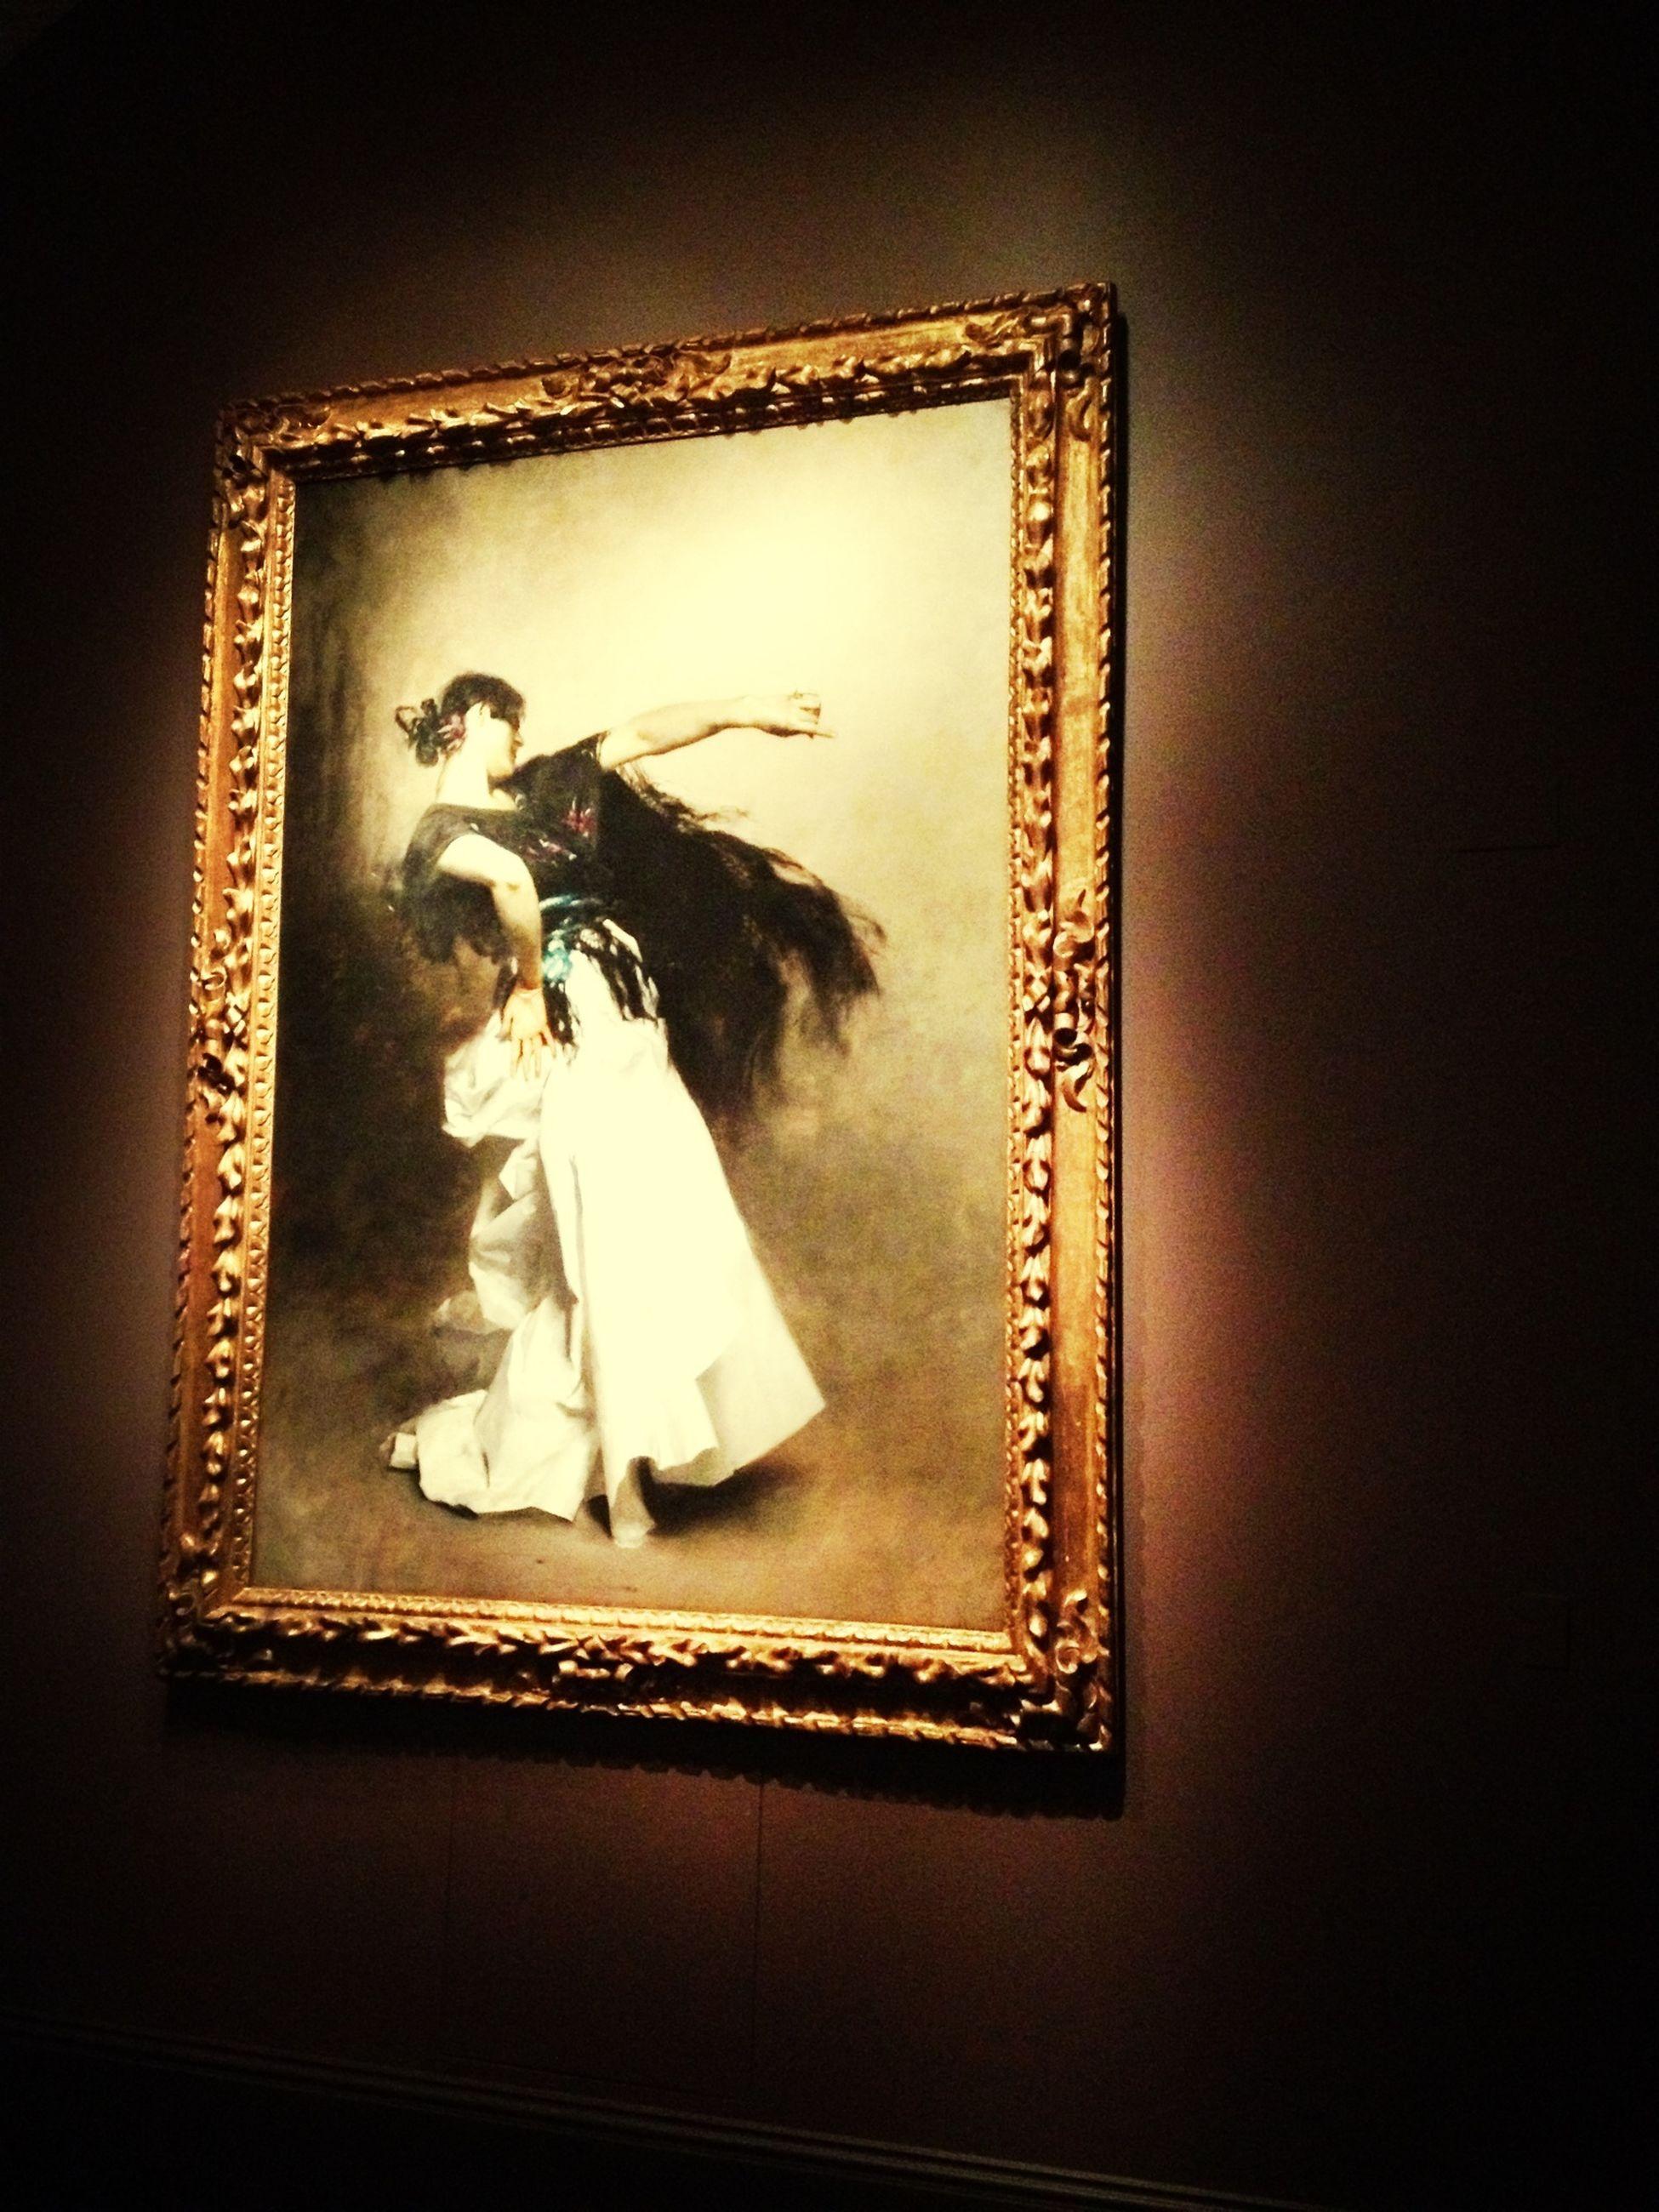 indoors, art and craft, art, studio shot, human representation, creativity, black background, still life, close-up, decoration, decor, illuminated, religion, ornate, copy space, wall - building feature, hanging